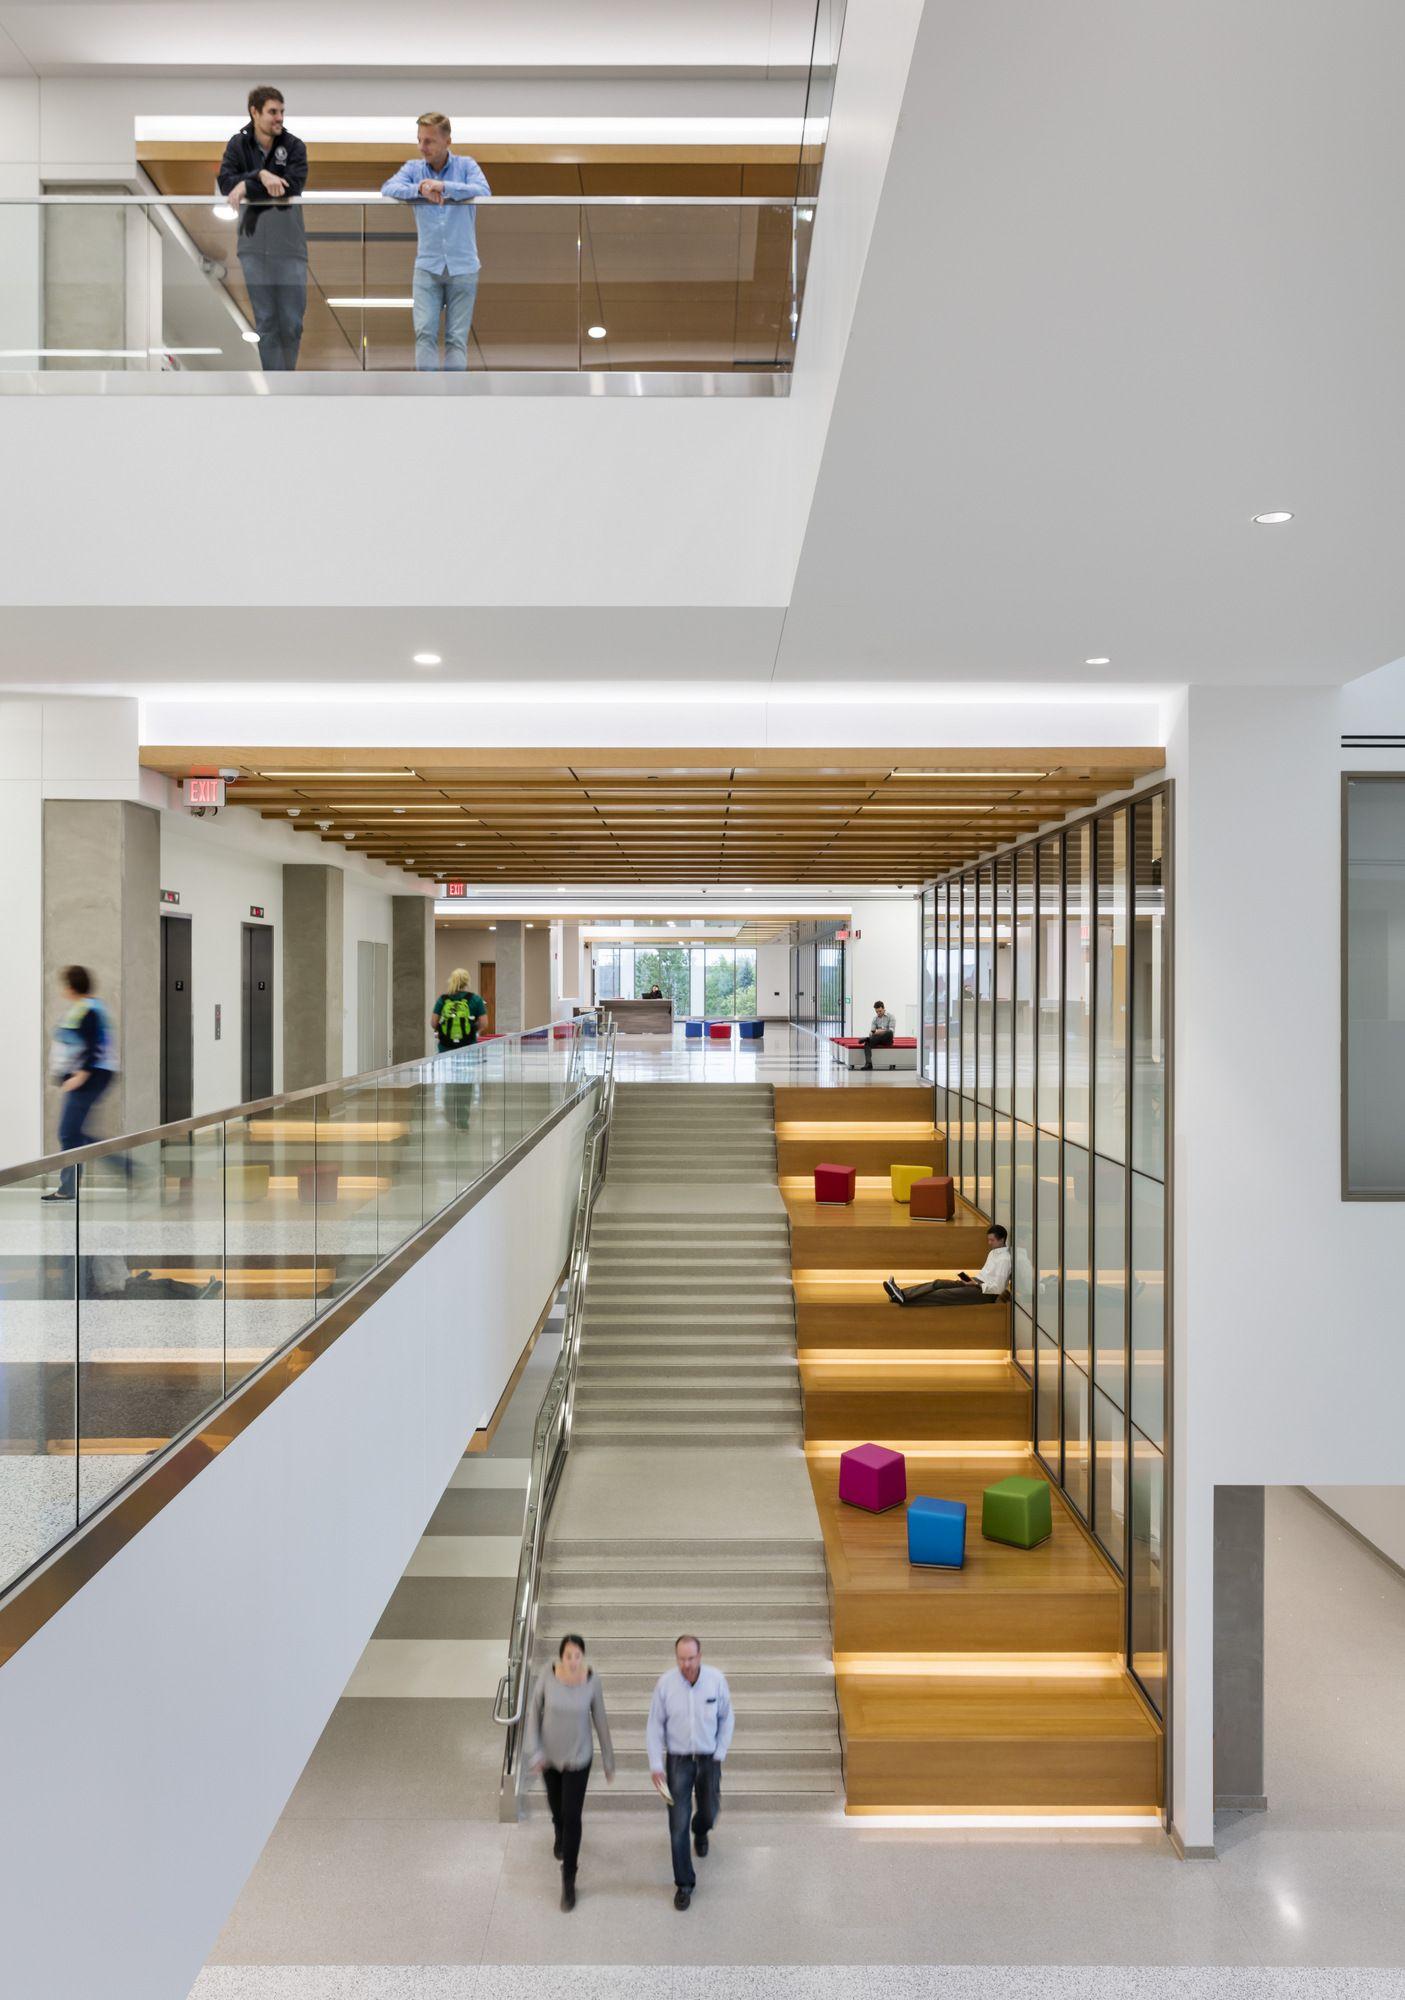 Perkins Will Jlg Architects And Steinberg Architects Have Designed The Universit Education Architecture University Interior Design University Of North Dakota